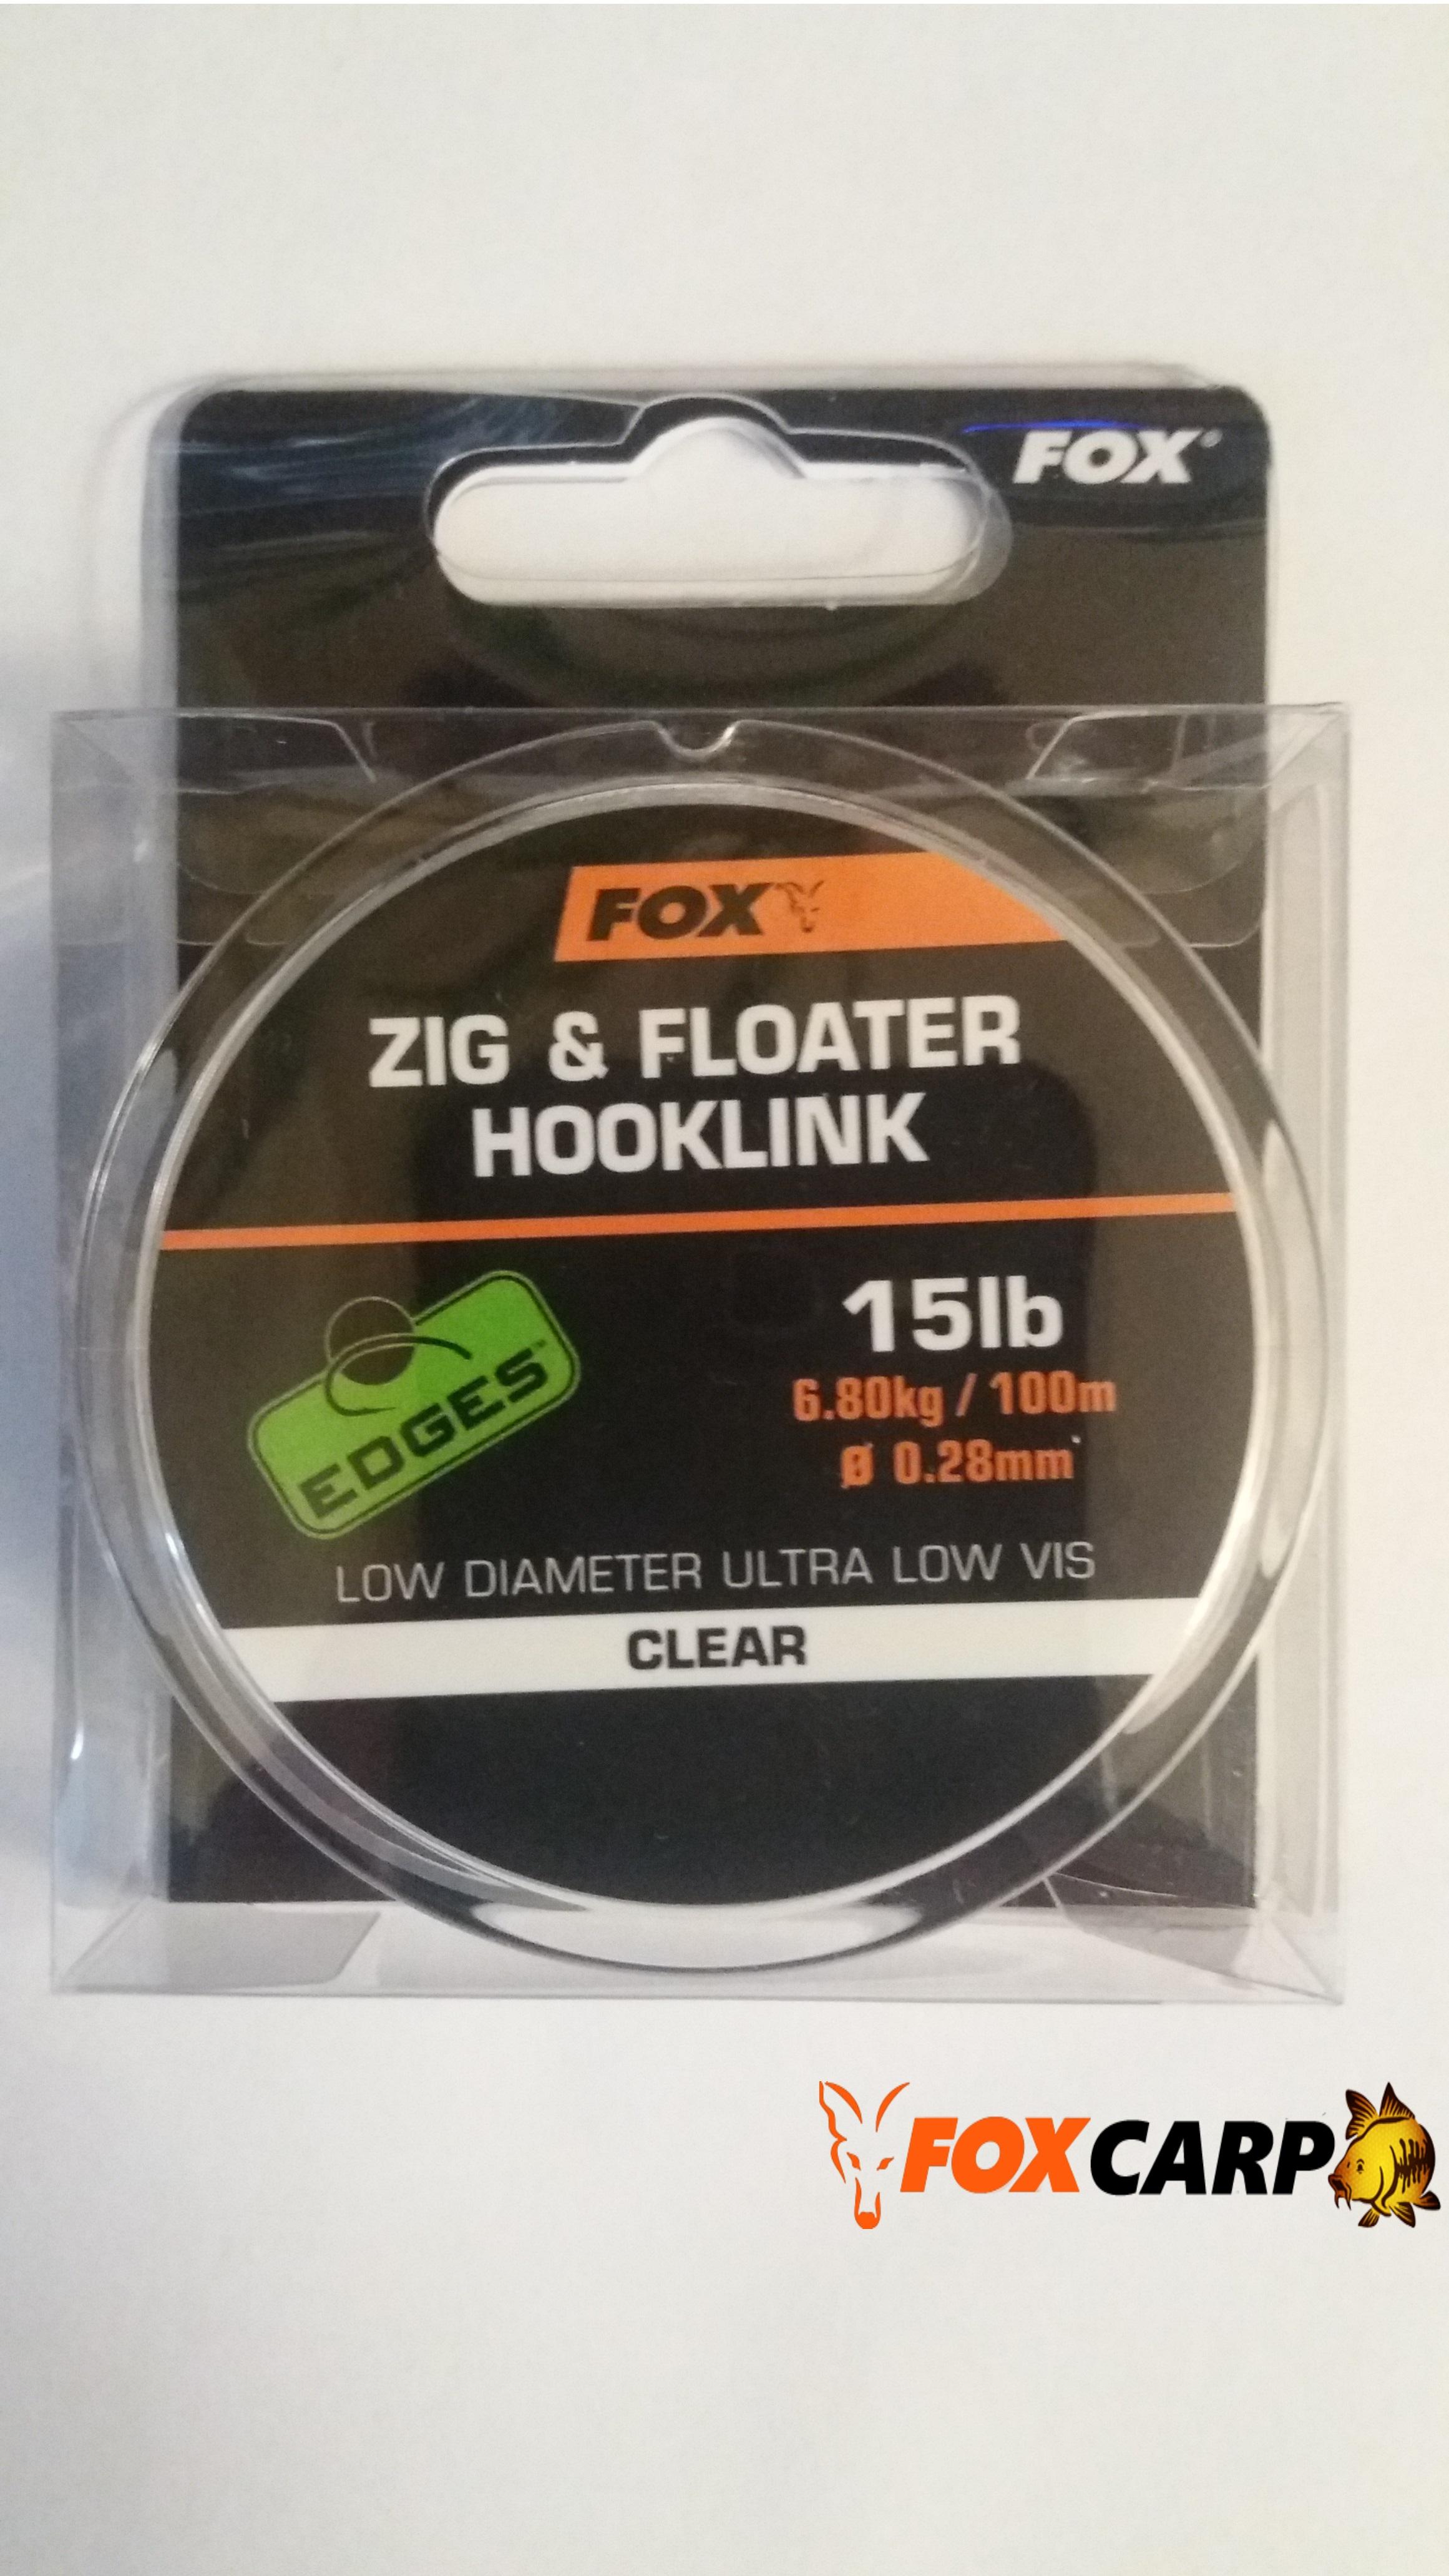 Fox Плавающий поводочный материал для Зиг-Риг Zig + Floater Hooklink